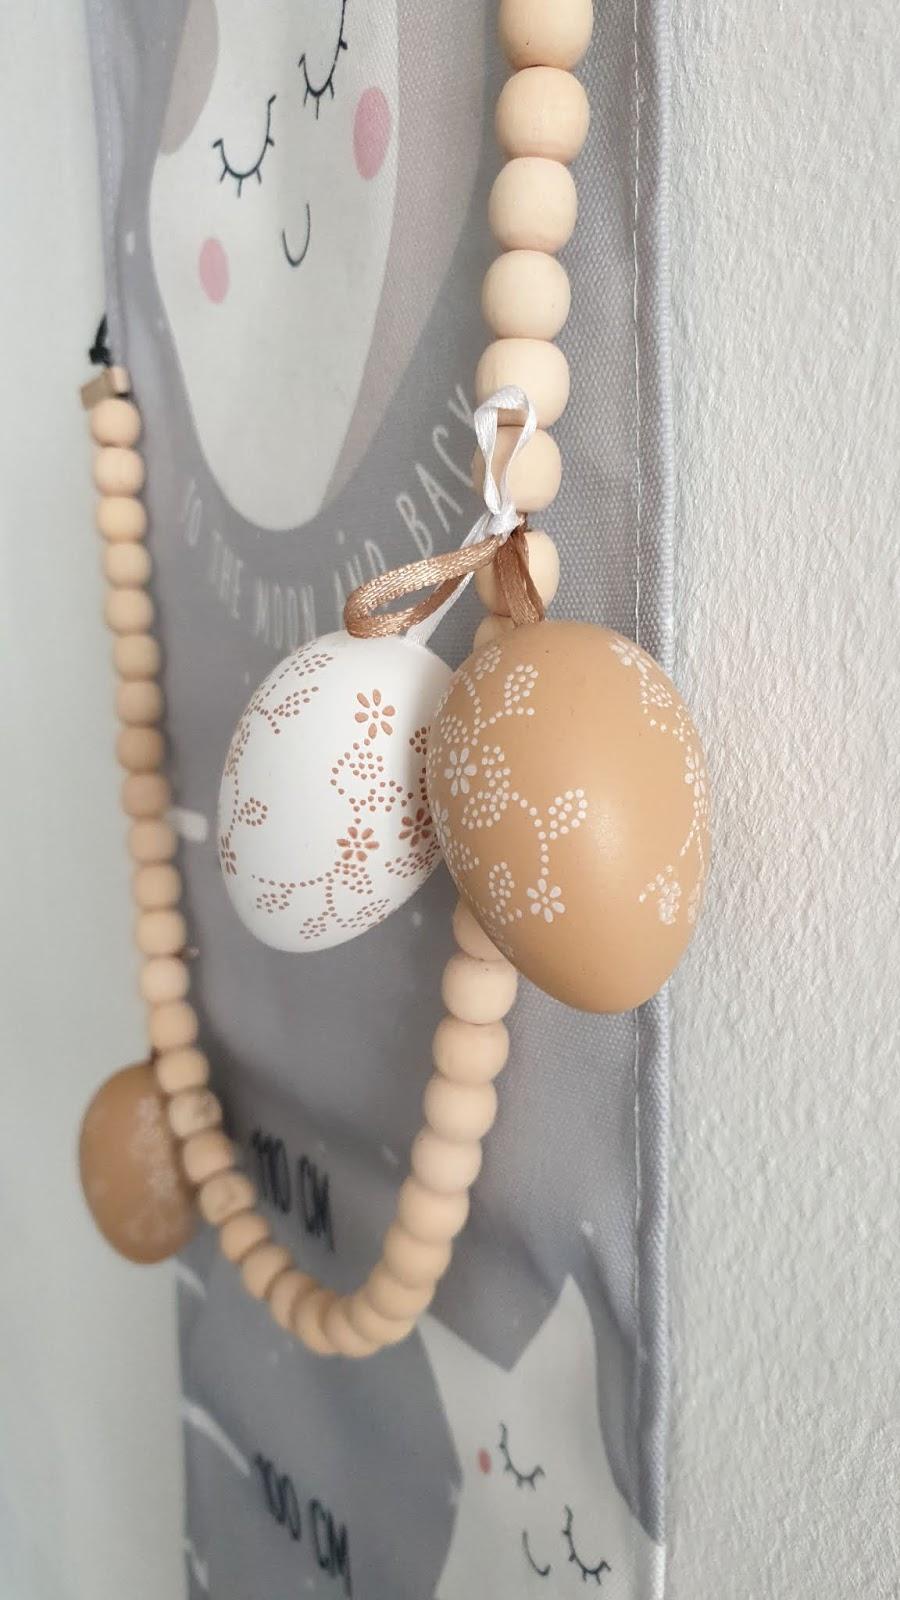 koraliki z drewna i jajka